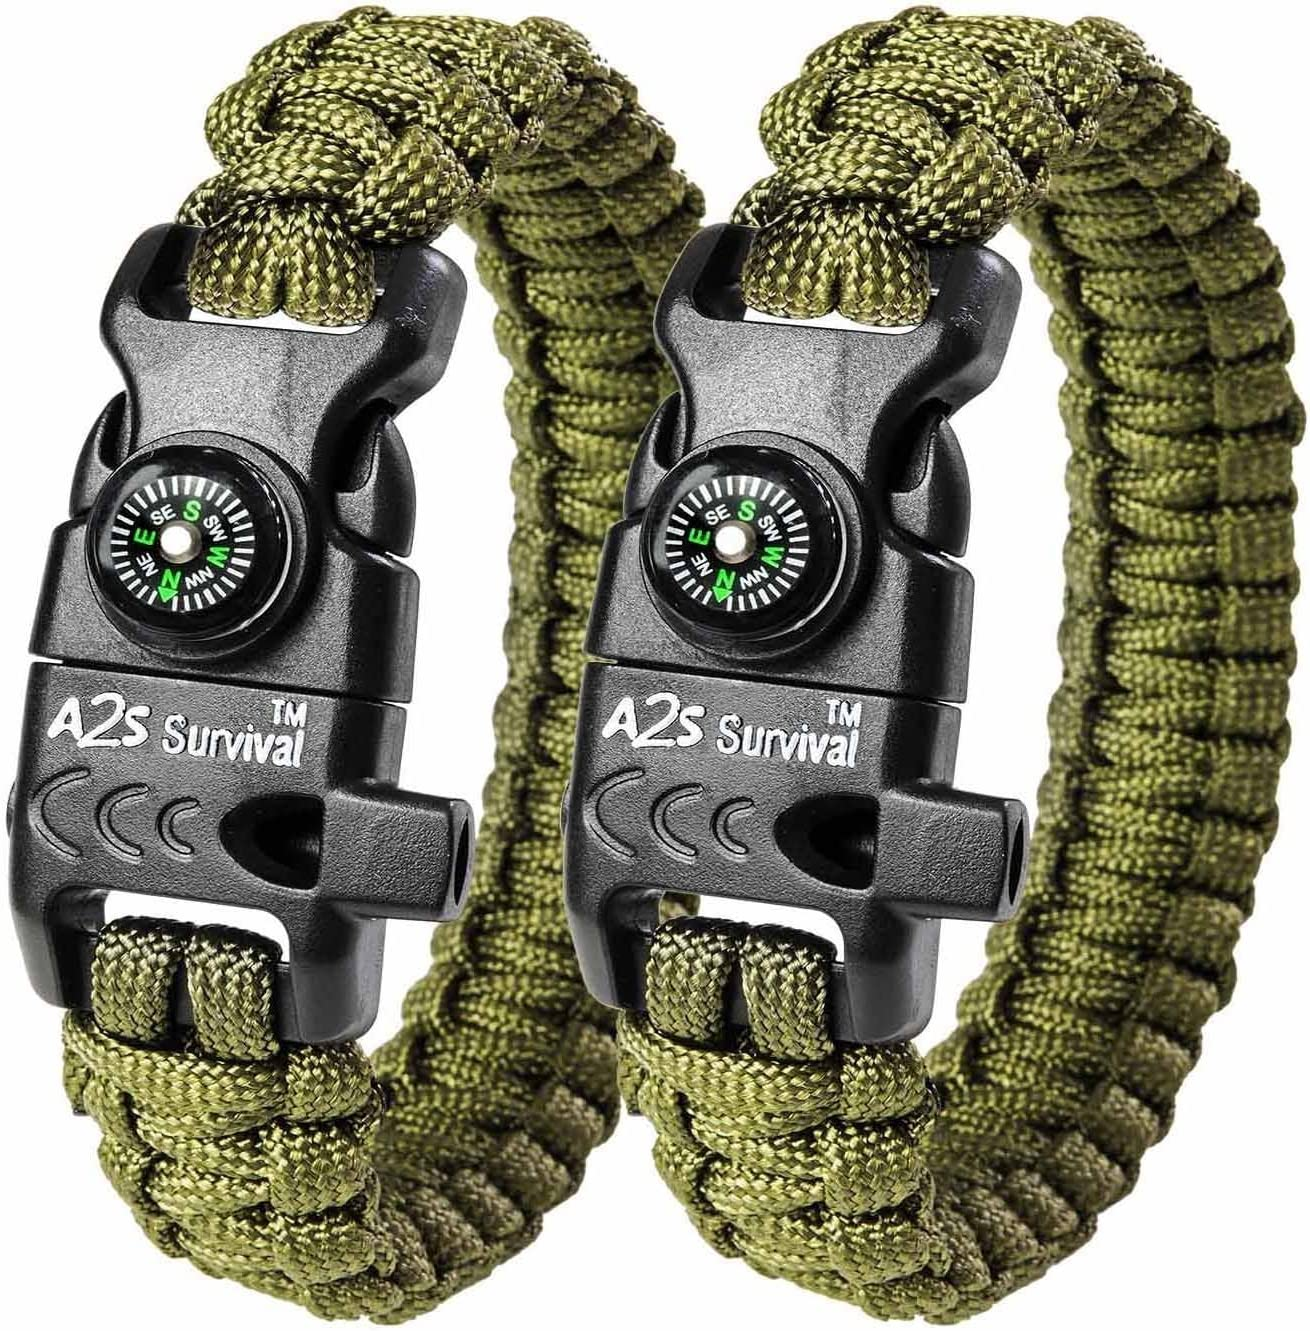 Paracord Bracelet K2-Peak – Survival Bracelets with Embedded Compass, Fire Starter, Emergency Knife & Whistle EDC Hiking Gear- Camping Gear